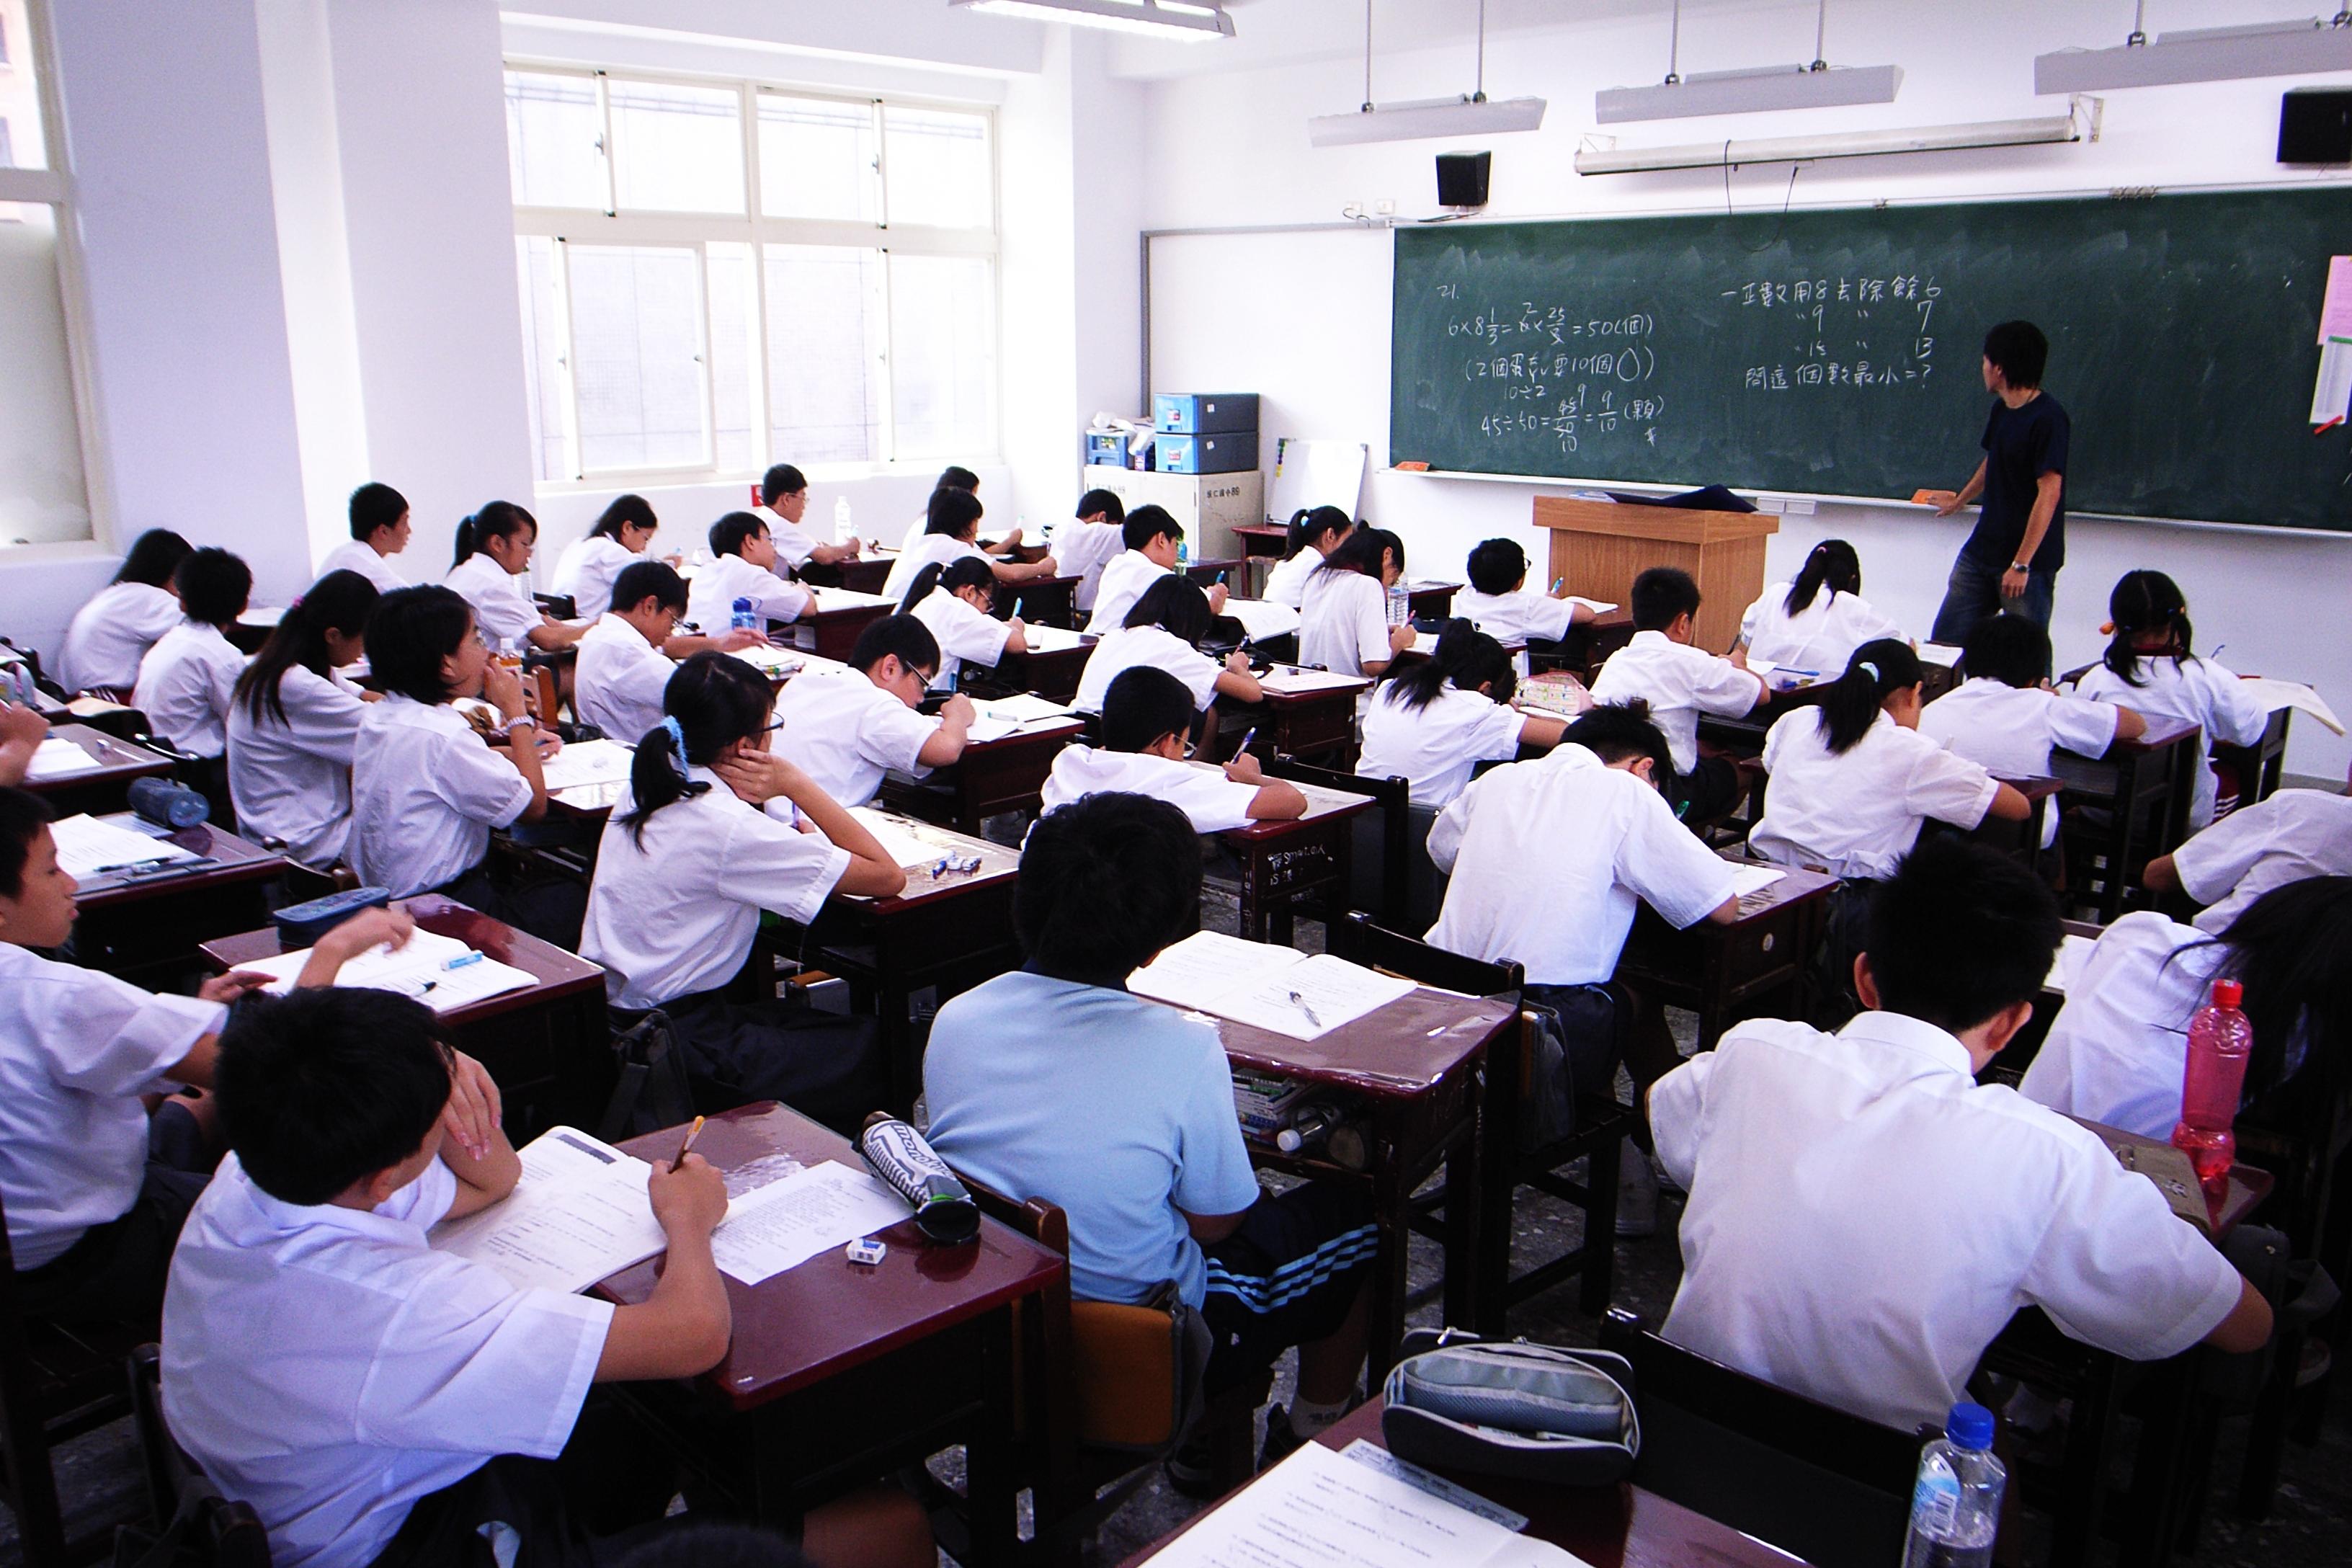 file math class in chu jen junior high school 2007 08 23 jpg